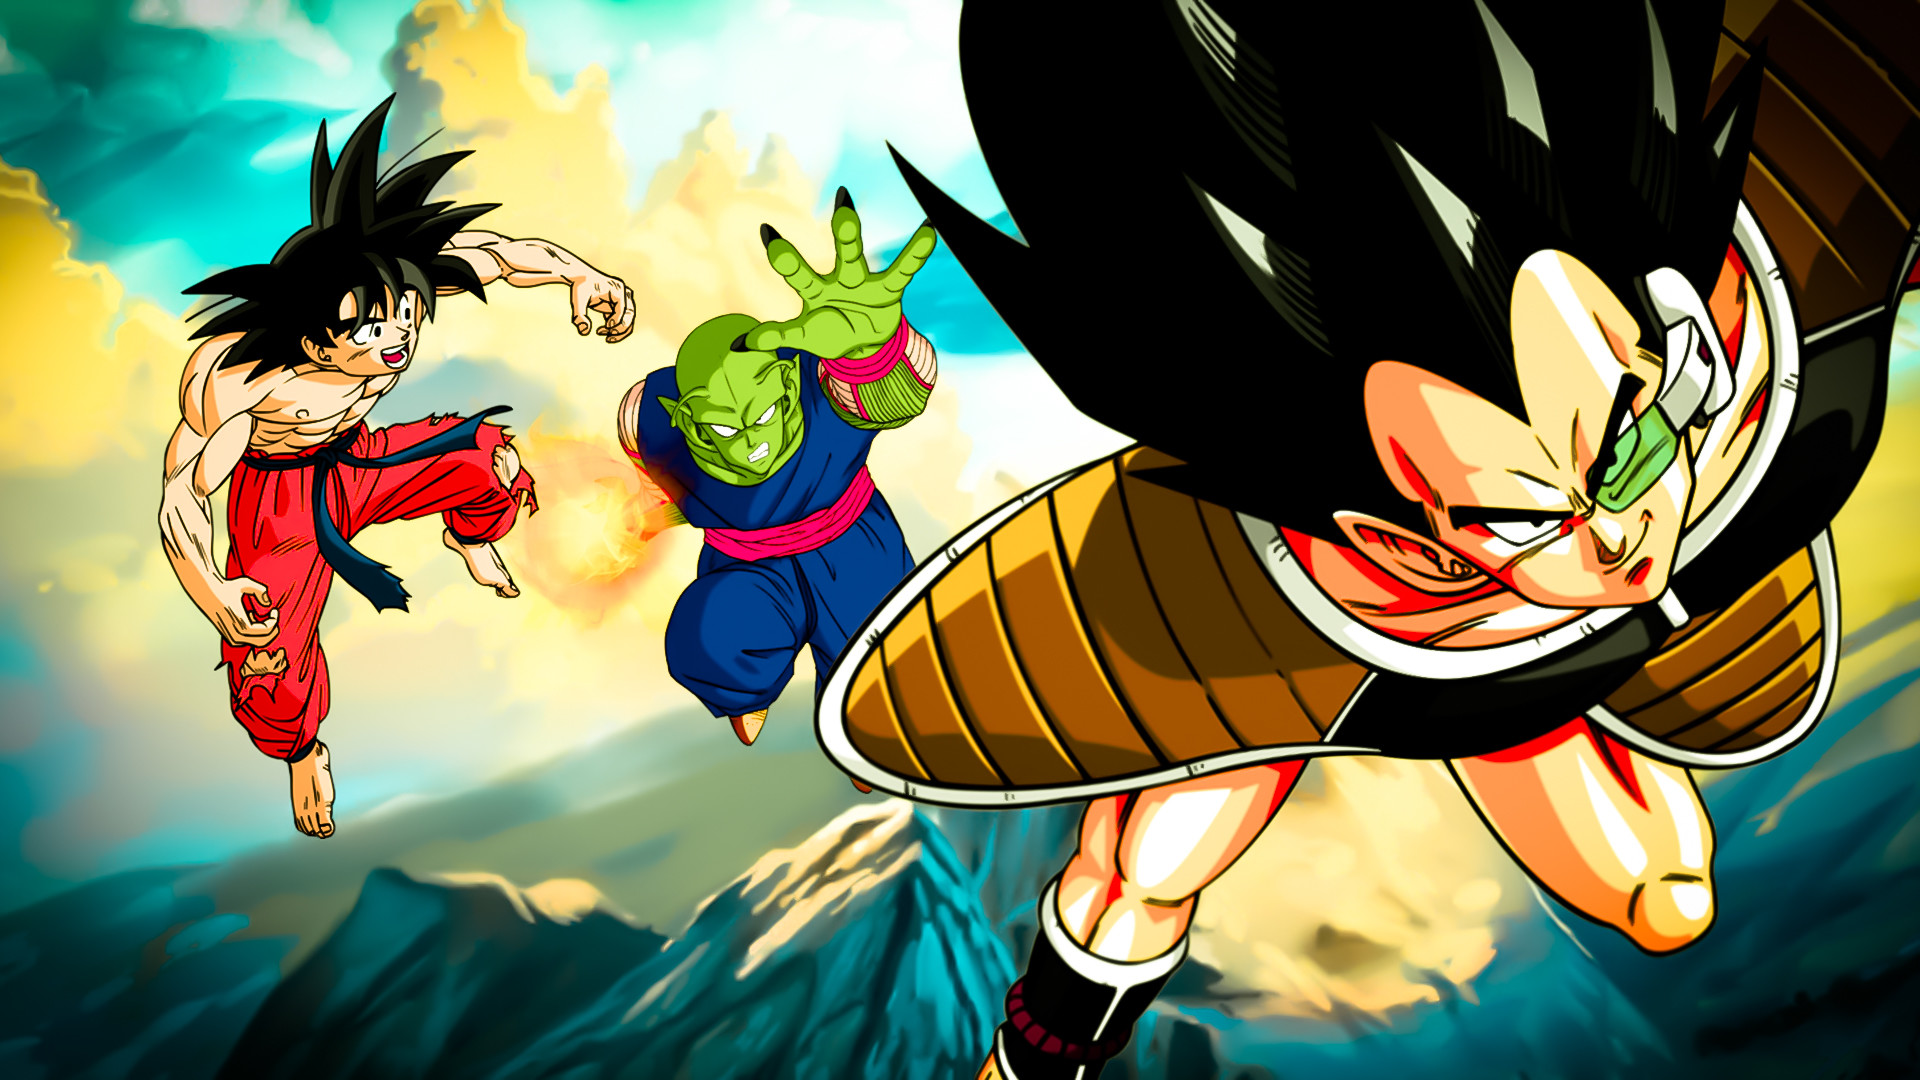 DBZ SS4 Goku vs Vegeta HD Wide Wallpaper for Widescreen (70 Wallpapers) –  HD Wallpapers